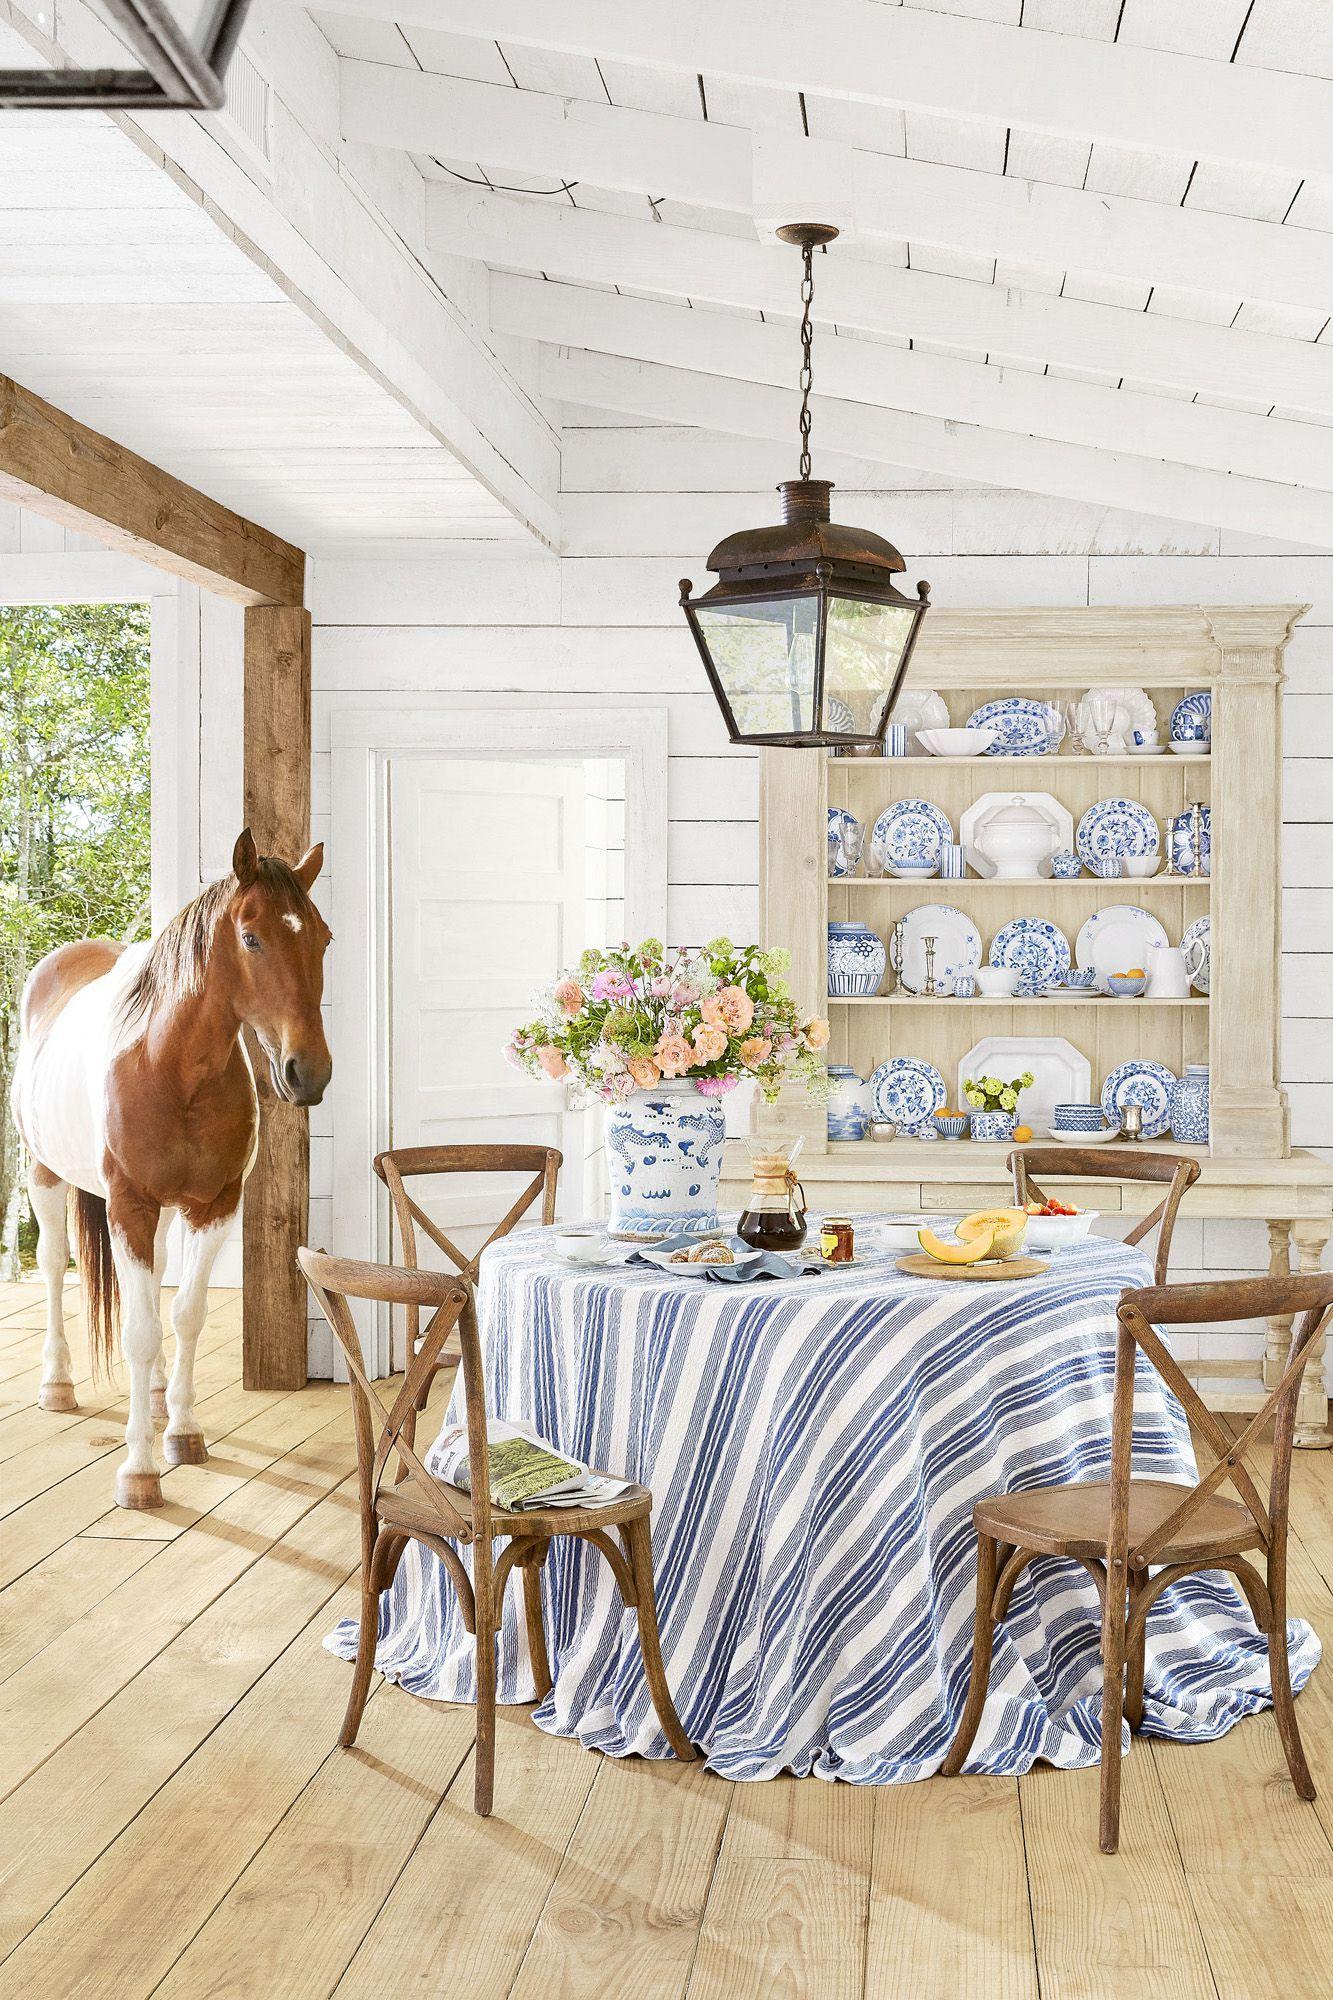 Our Favorite Farmhouse Décor Ideas for Your Dream Country